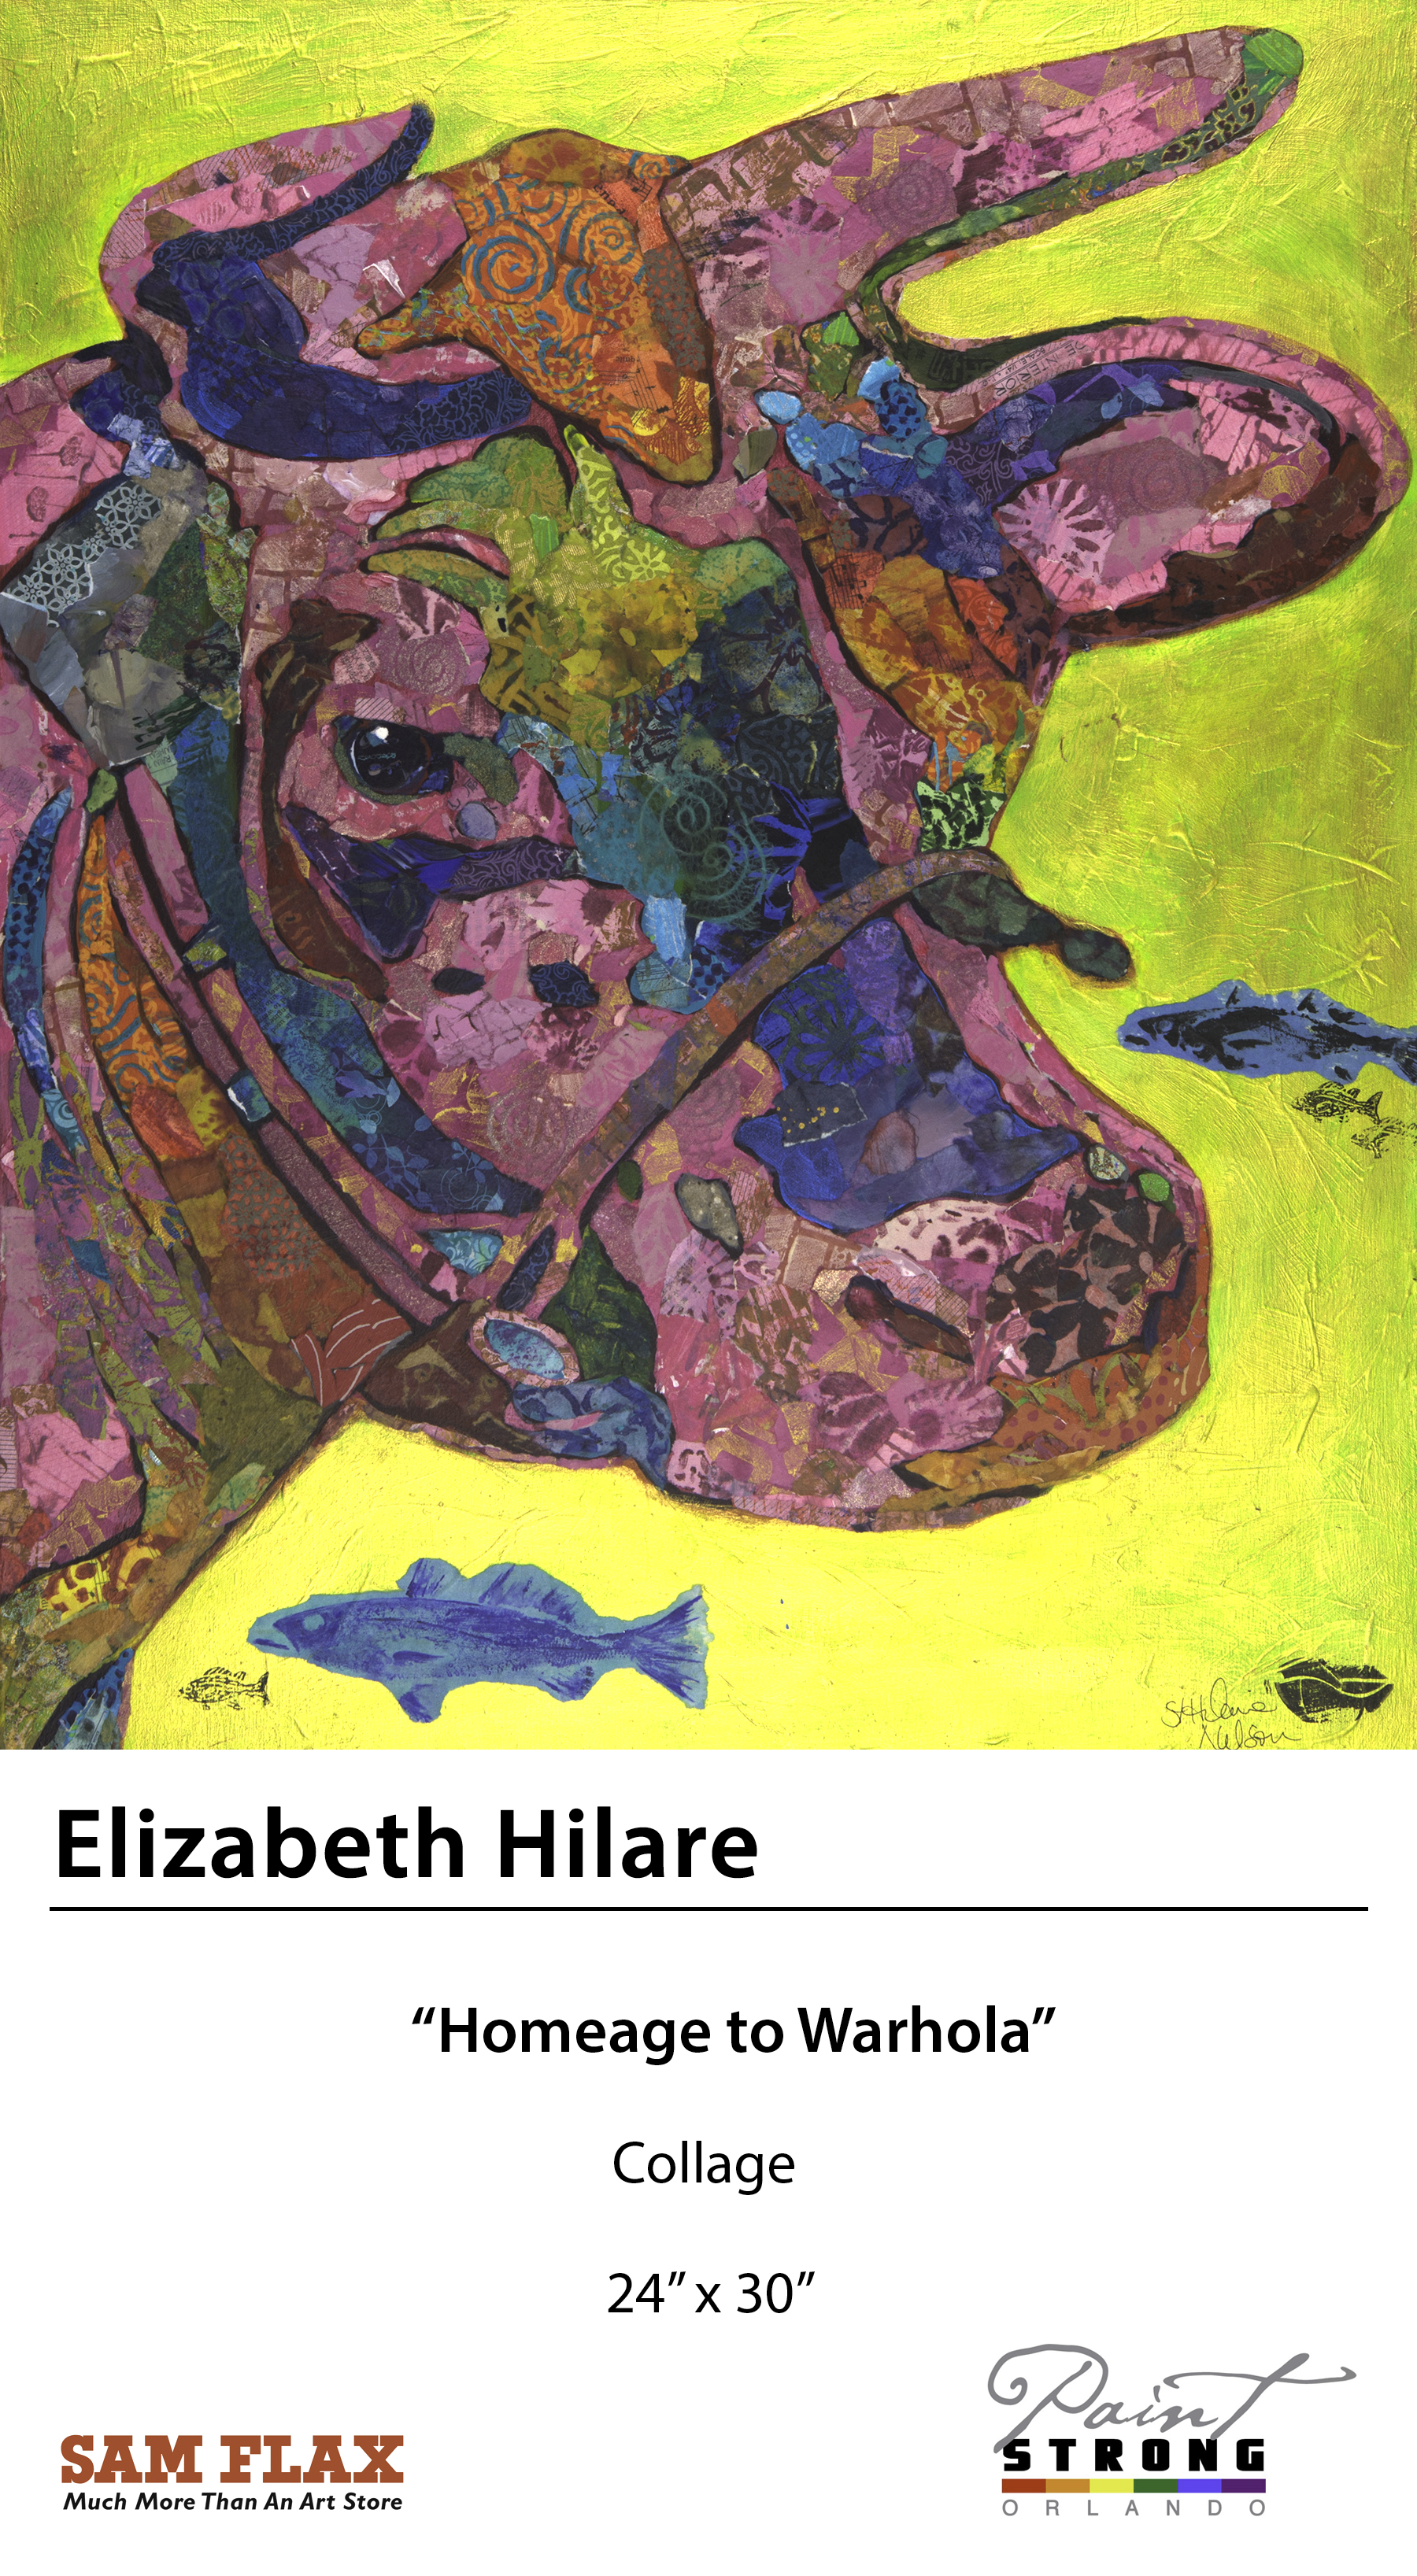 Elizabeth Hilare